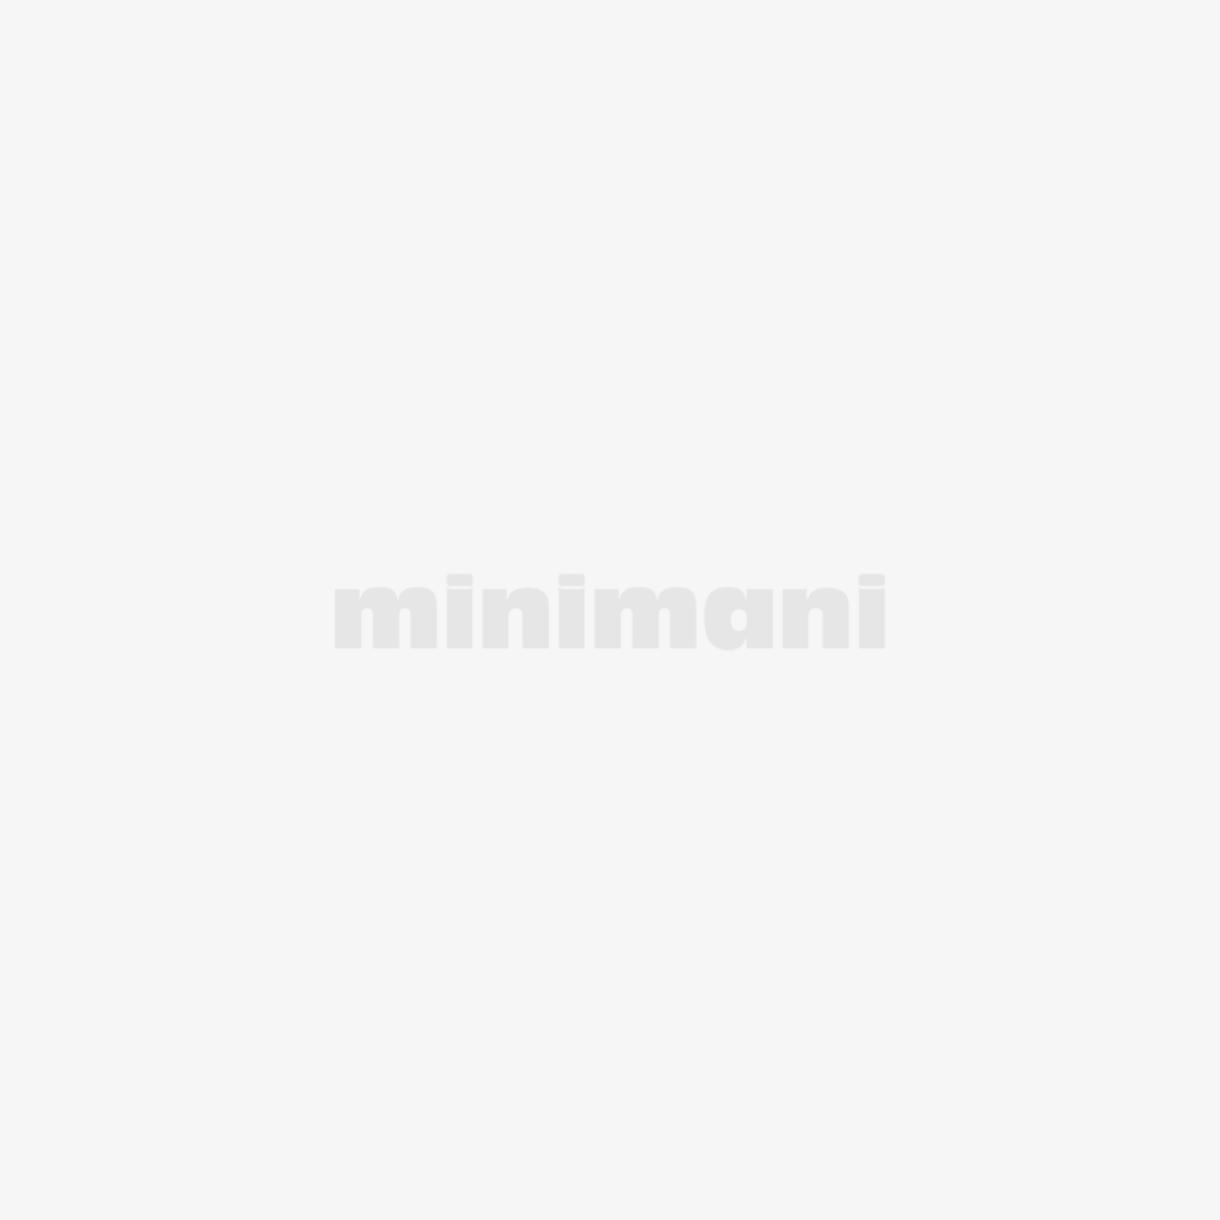 FINNWEAR MIESTEN NILKKASUKAT, FRESH VILLA 43-45 1210